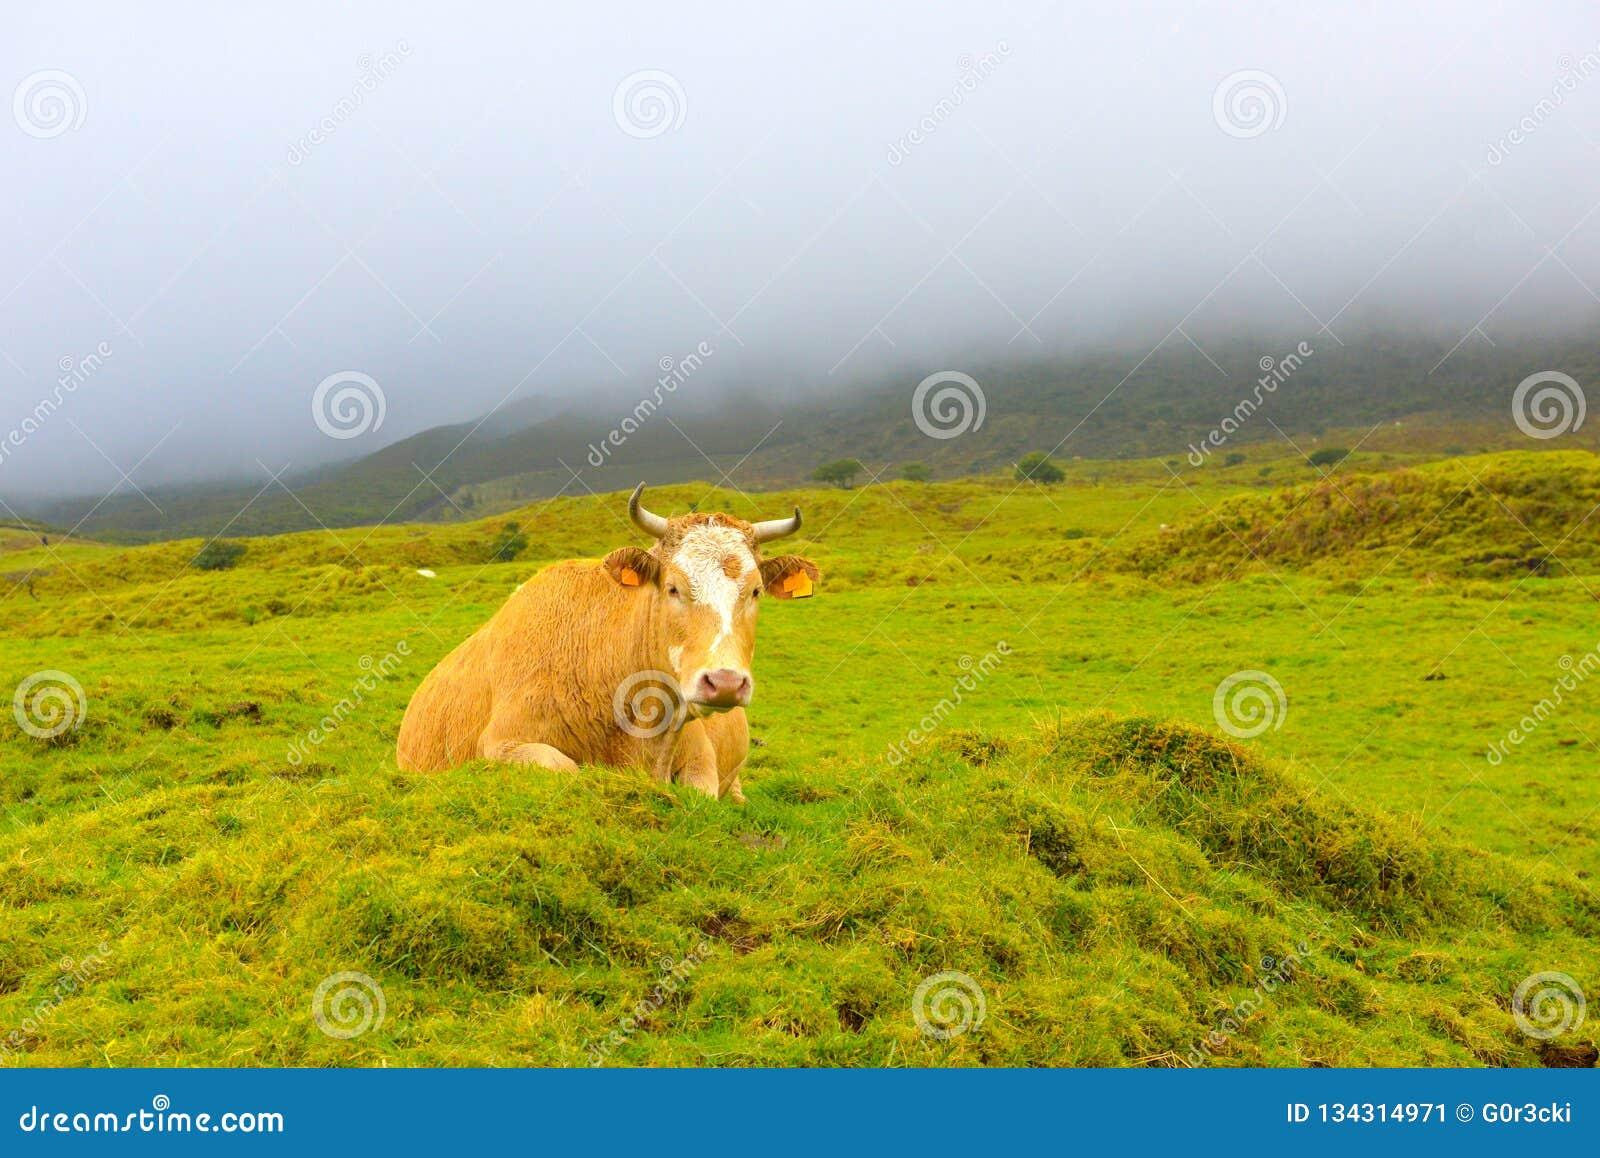 Azores - Pico island cow, Farm Animals in the wild, Stormy dark day